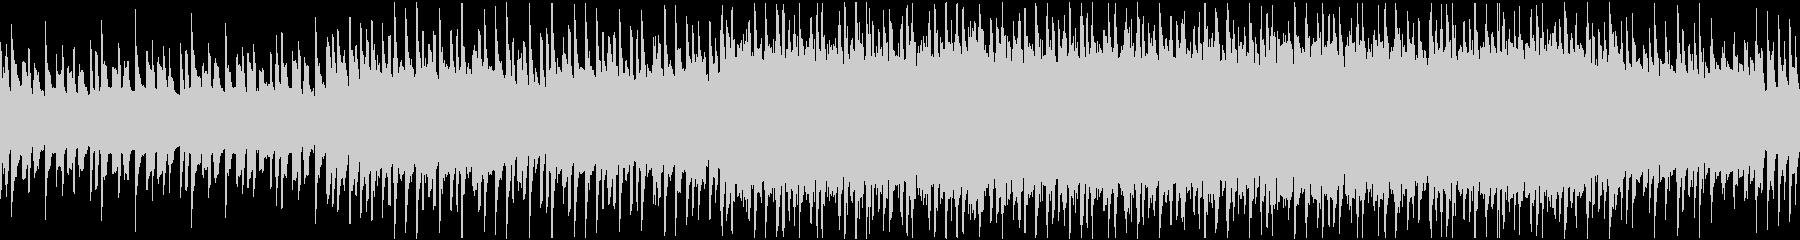 FM音源でアクションの未再生の波形